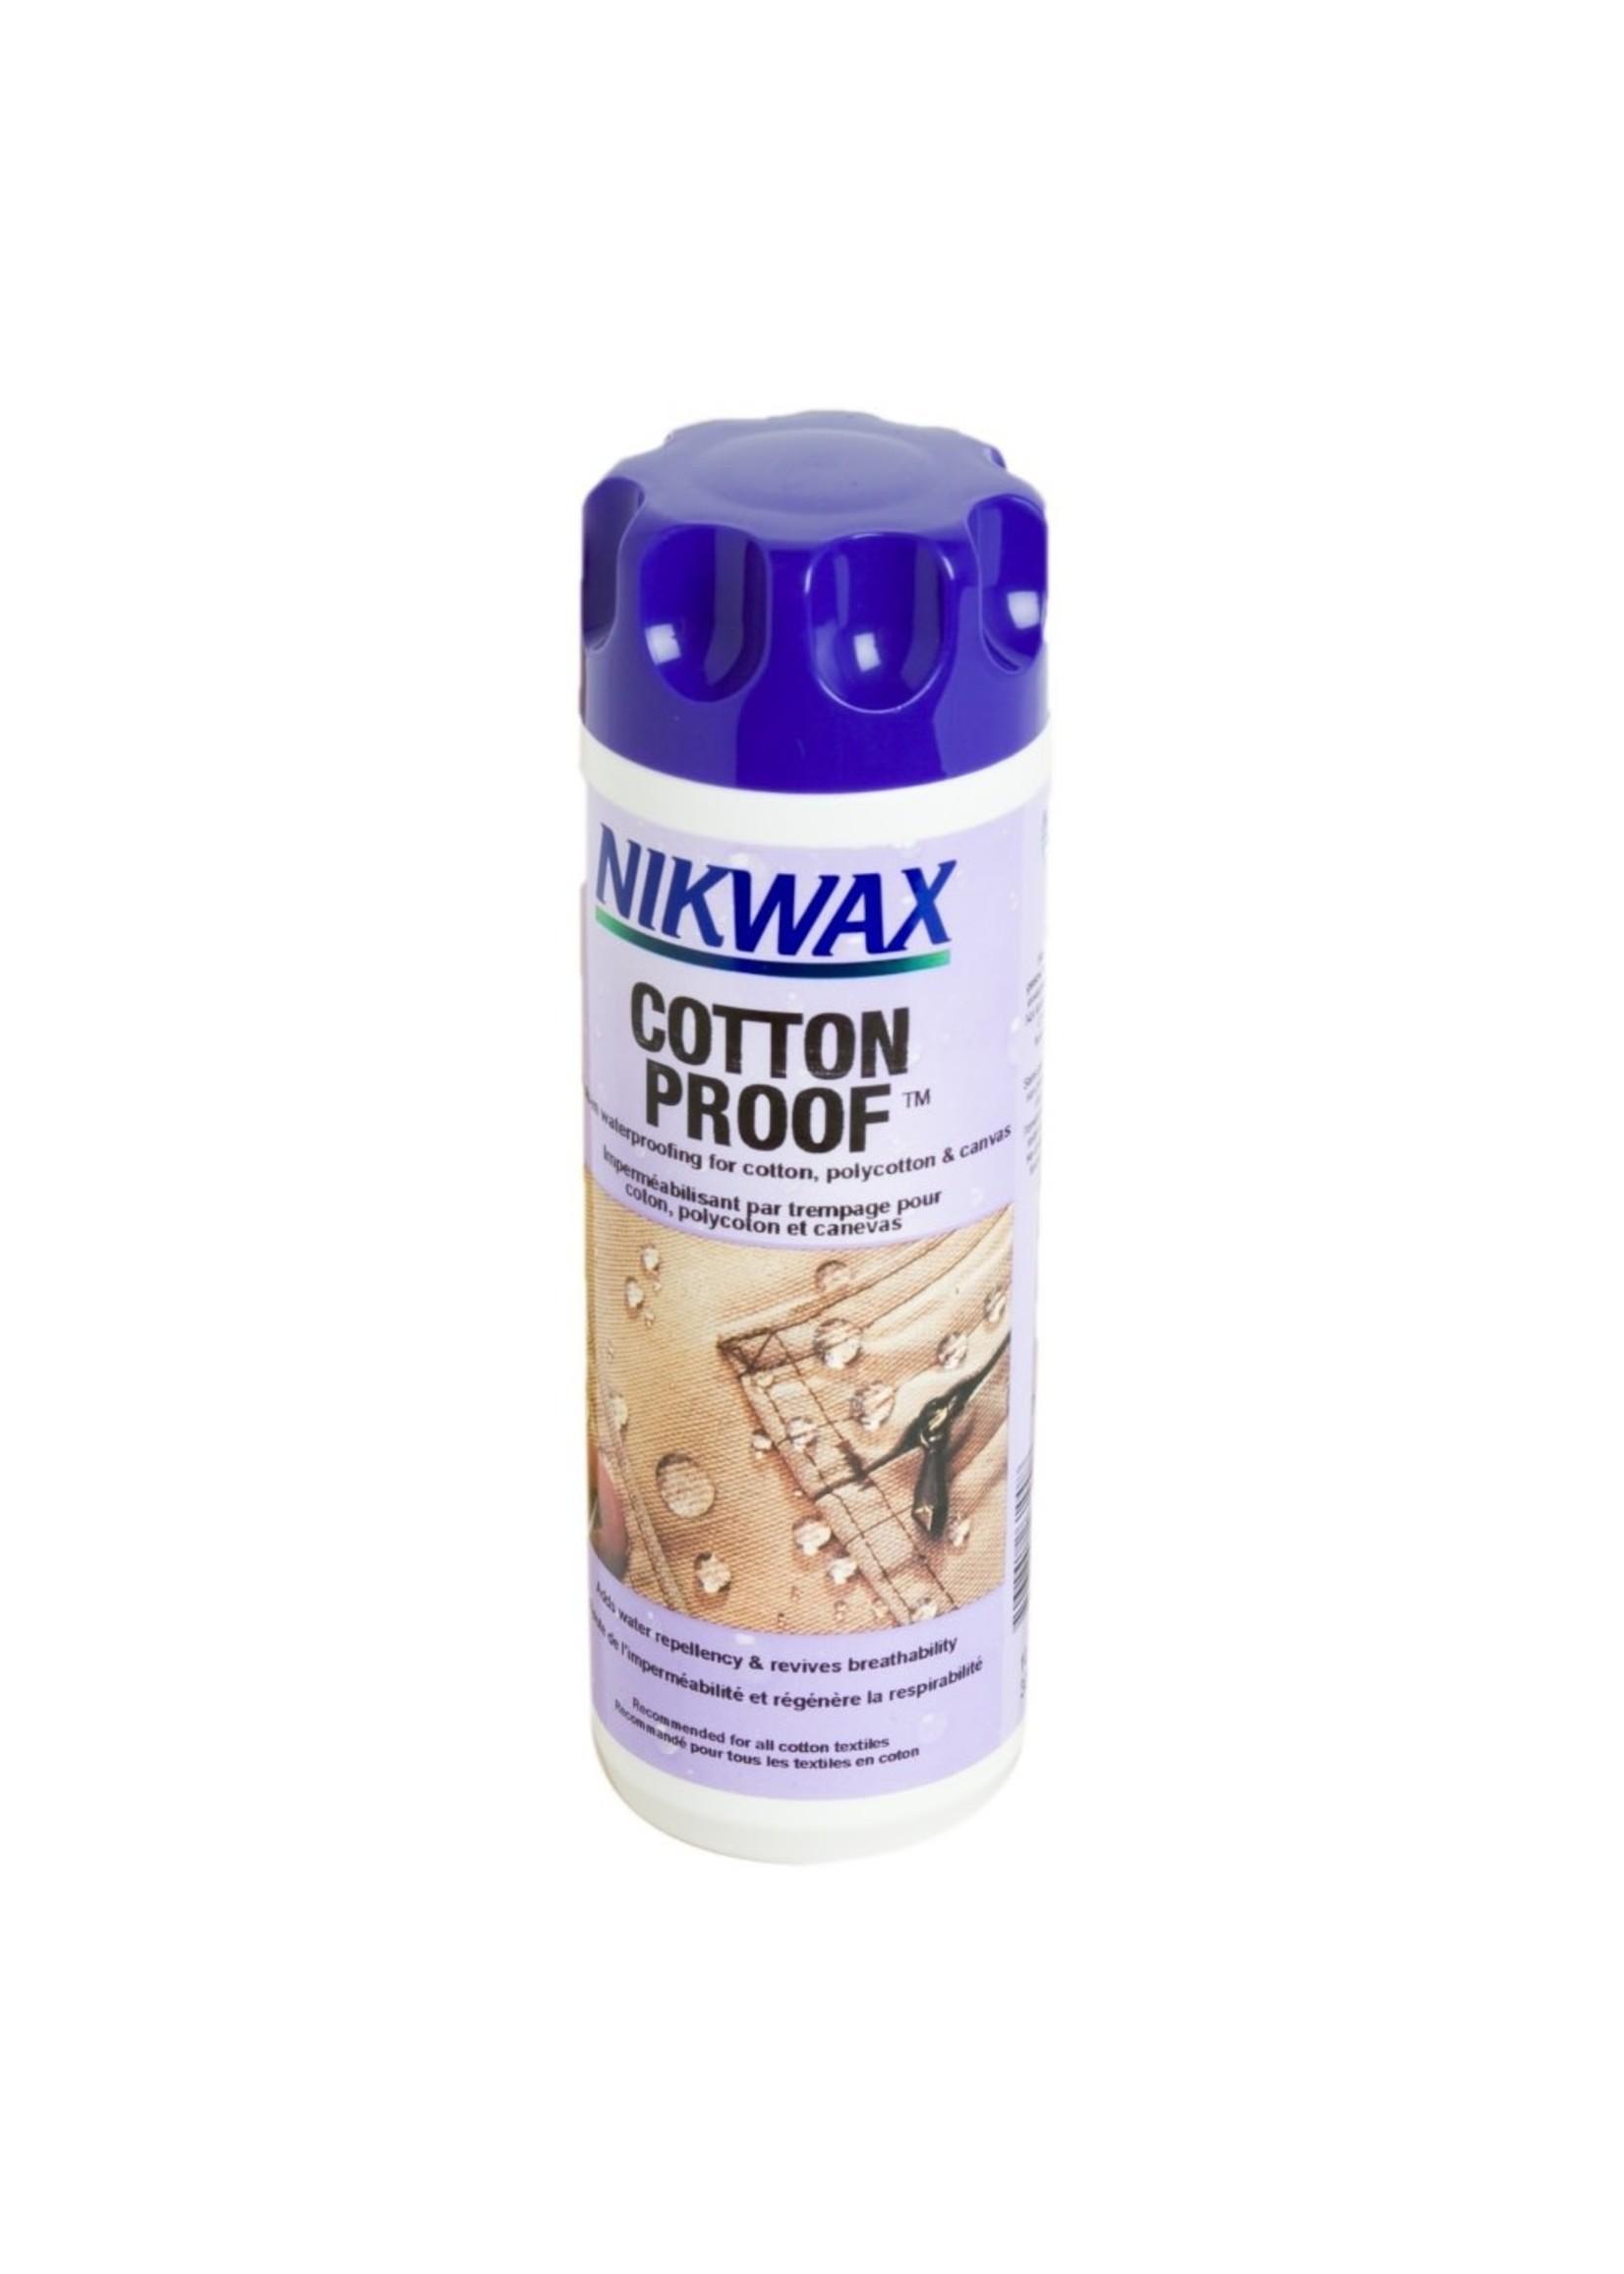 Nikwax Nikwax Cotton Proofing